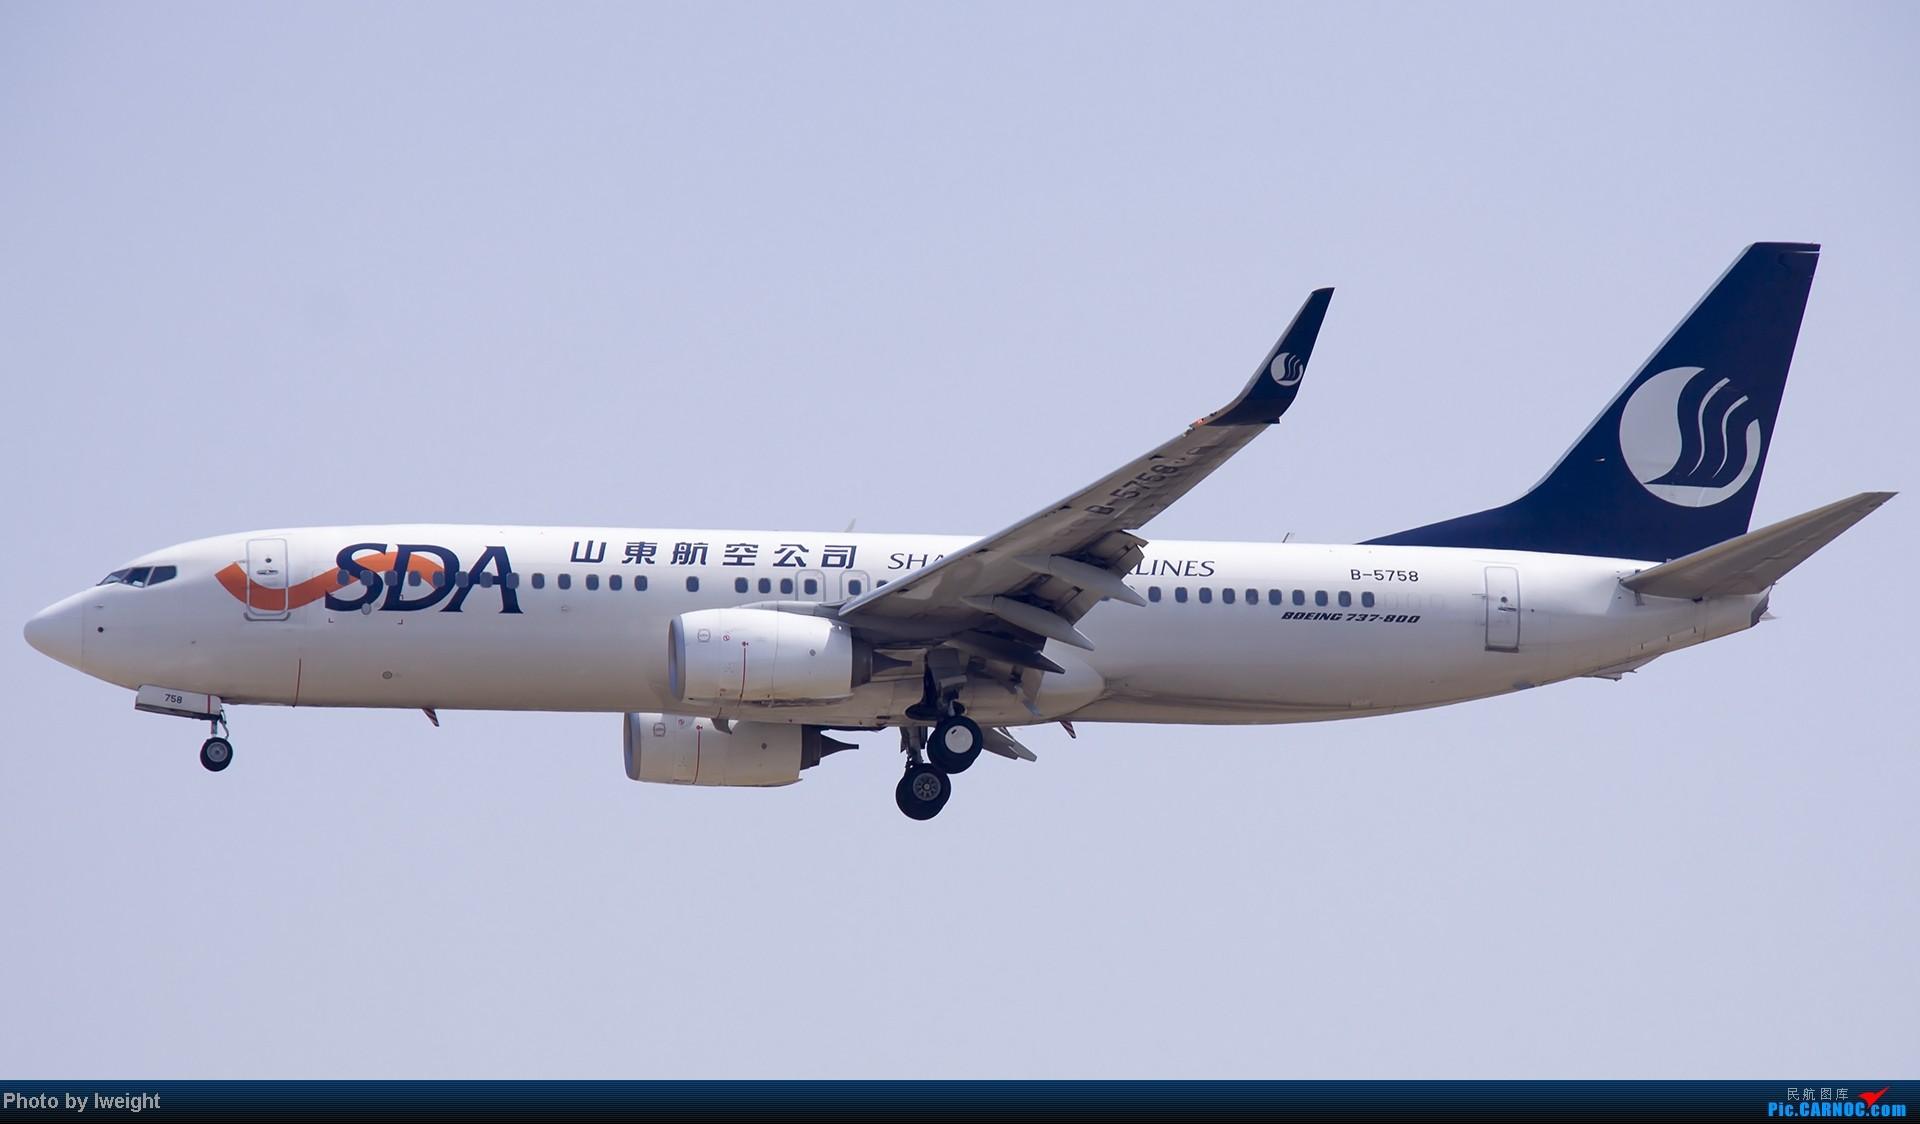 Re:[原创]错过了卡航的巴塞罗那号,只有这些大路货了,泪奔啊 BOEING 737-800 B-5758 中国北京首都机场